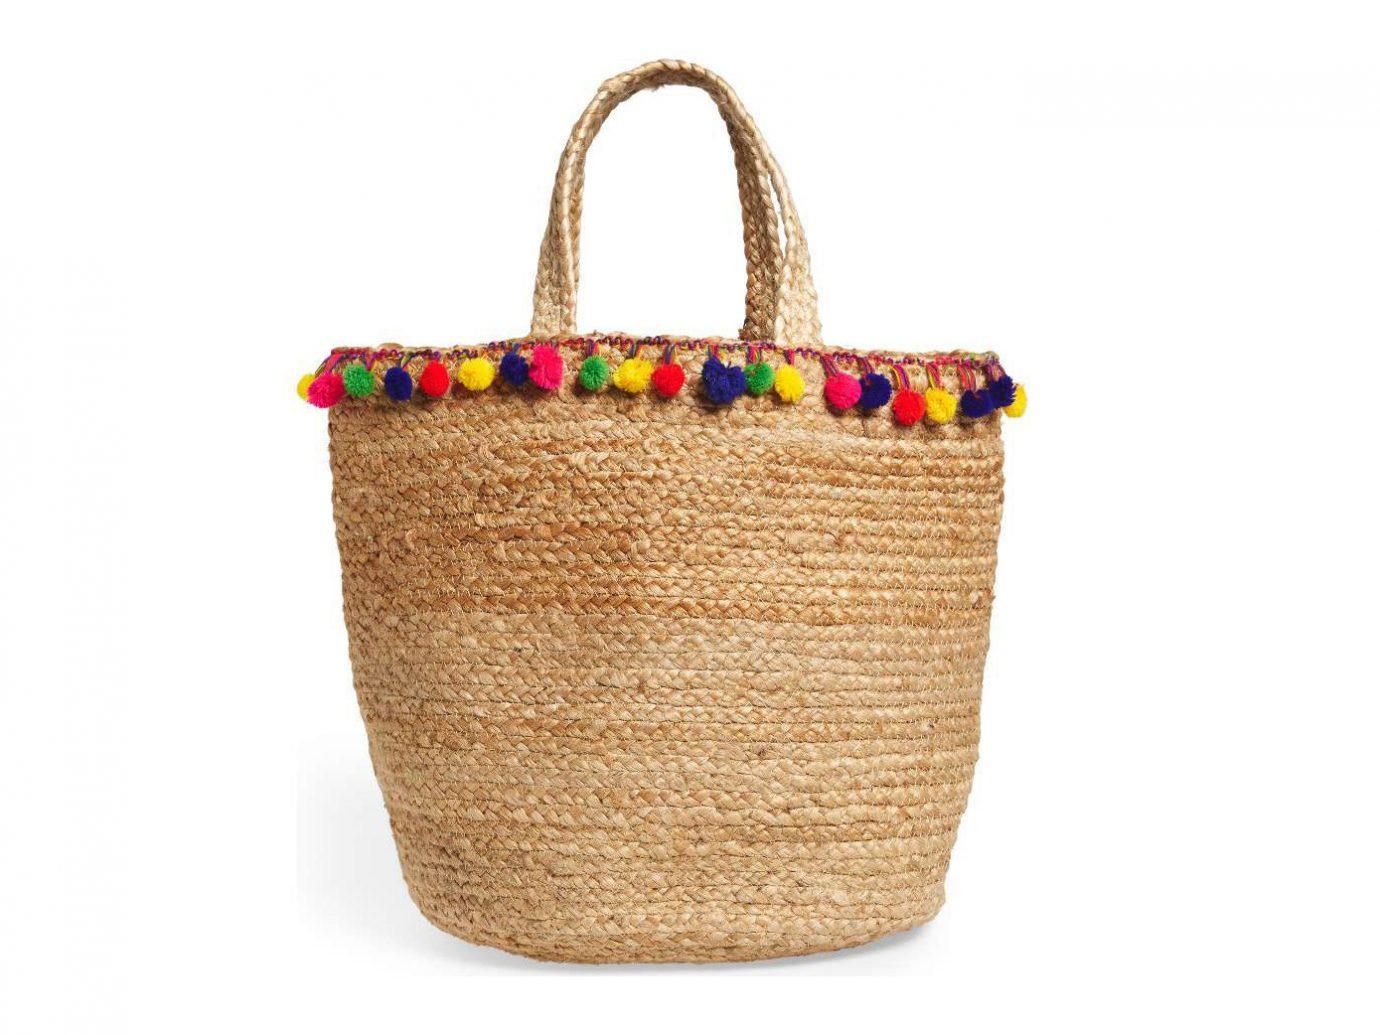 Style + Design straw handbag basket bag accessory colored